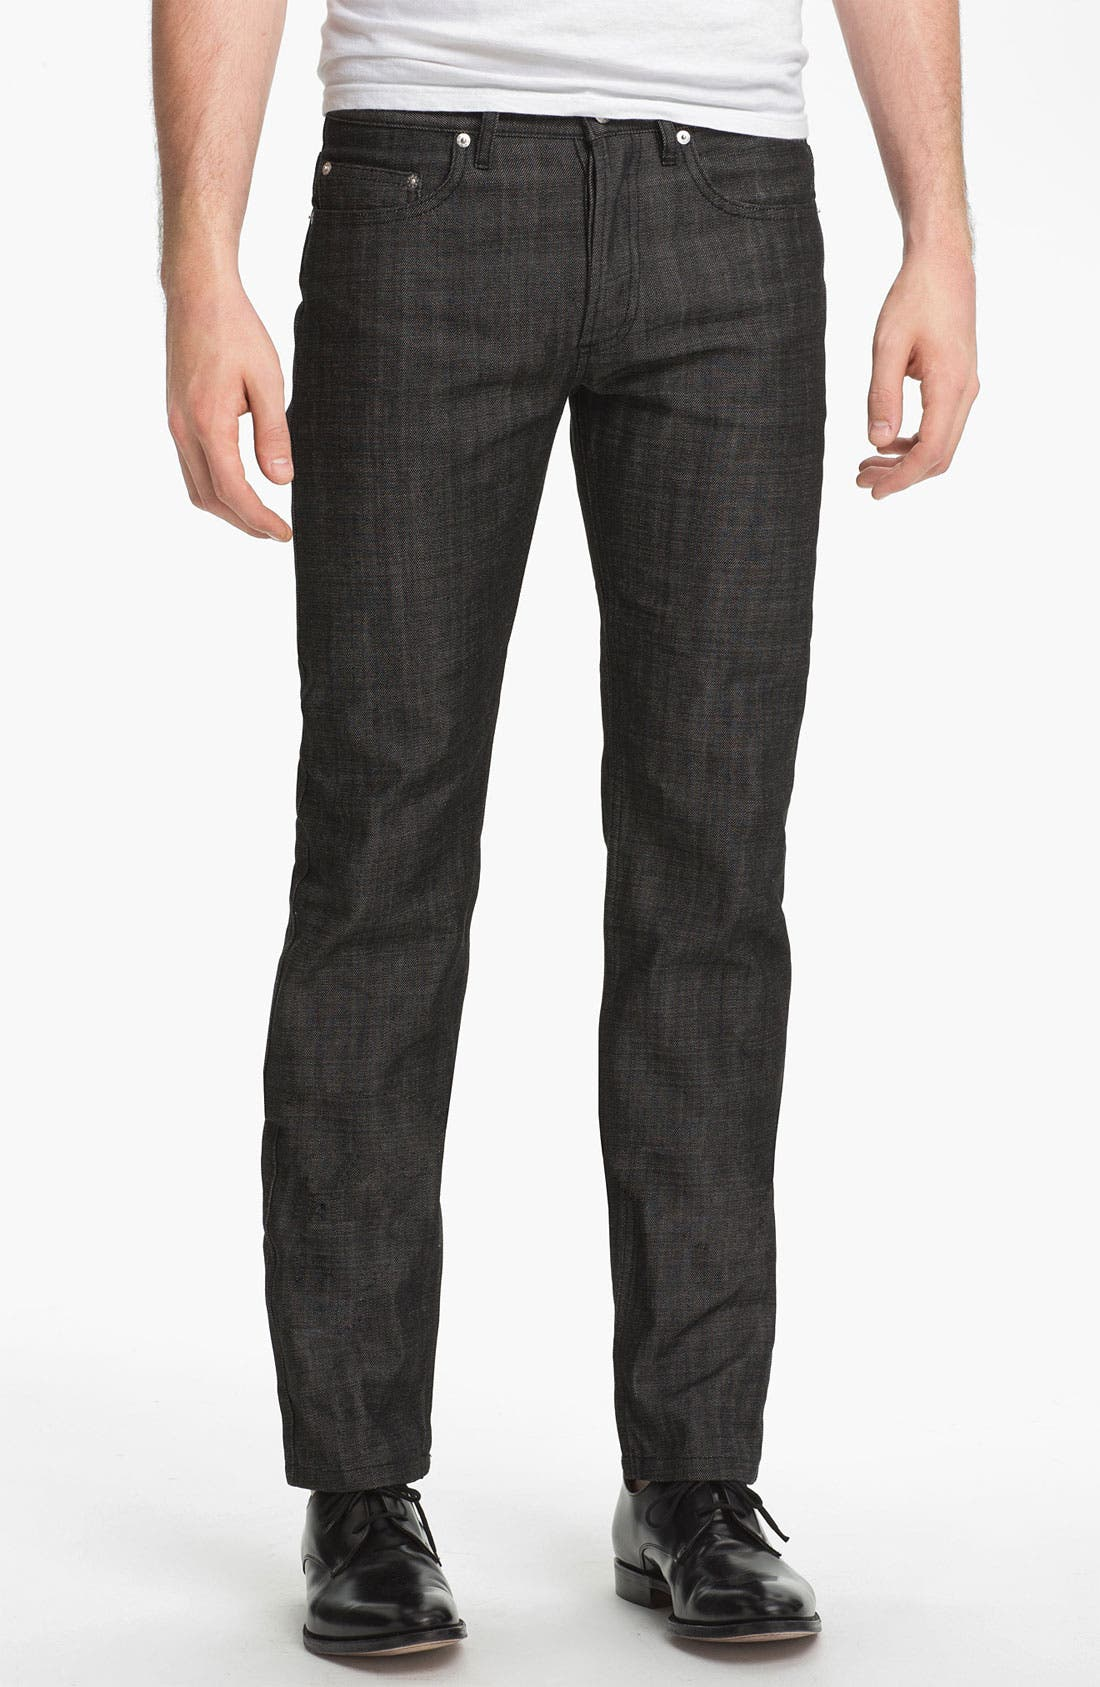 Alternate Image 1 Selected - A.P.C. 'New Standard' Slim Straight Leg Jeans (Black) (Online Only)